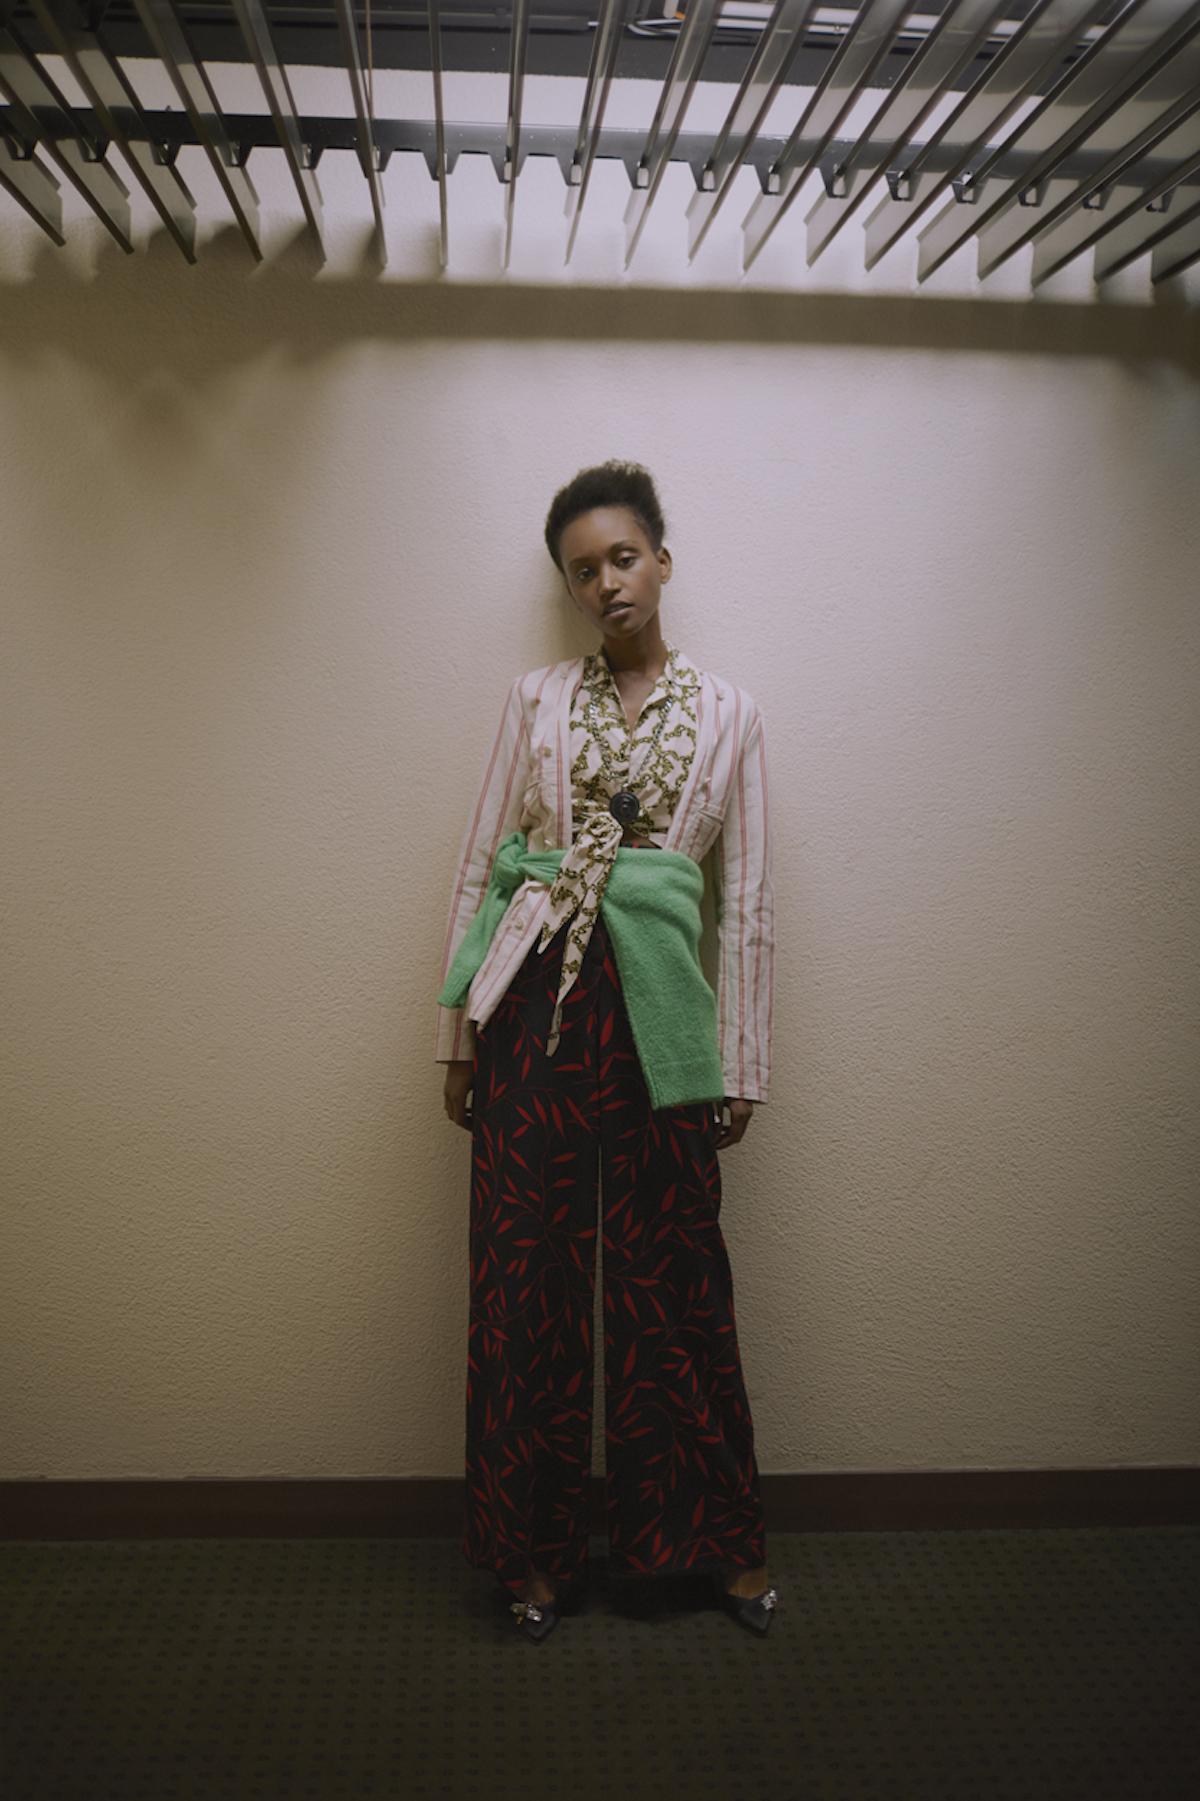 Teeth Magazine Online Guillaume Millet Christelle Yambayisa Premium Models MM6 Maison Margiela Carven